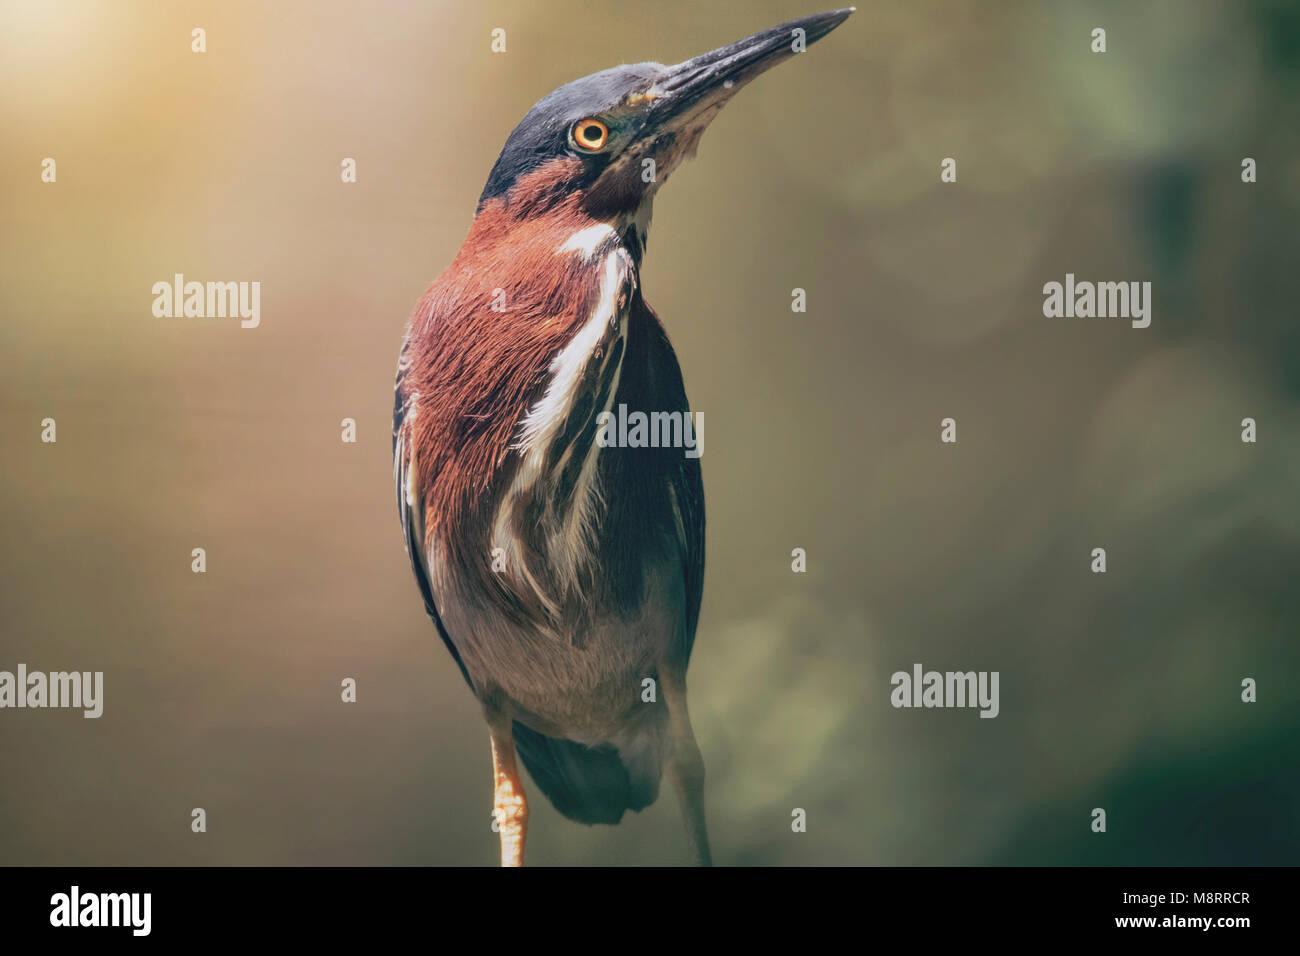 Cerca de Green Heron donde se posan en el exterior Foto de stock